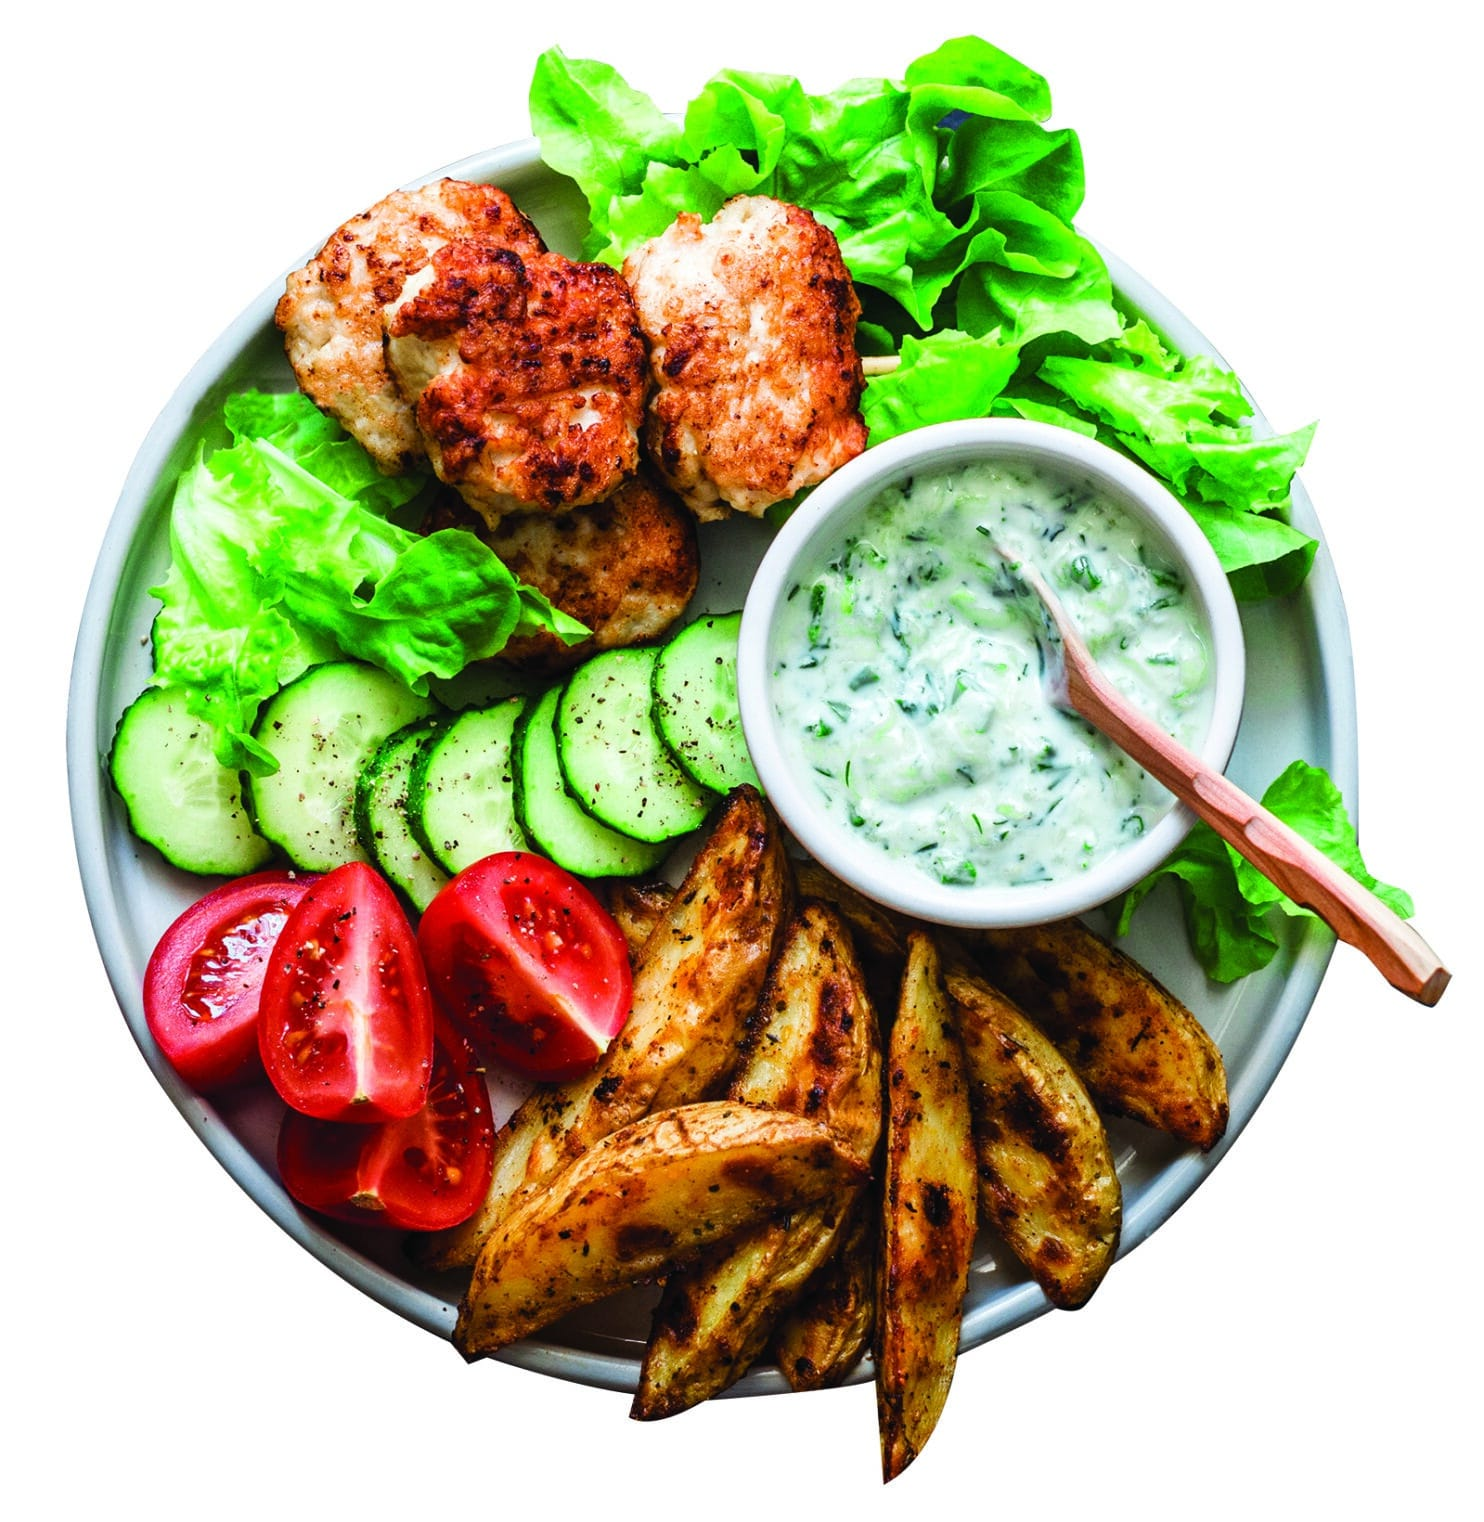 Fish skewers, baked potatoes, vegetables and yogurt greens sauce on dark background, top view